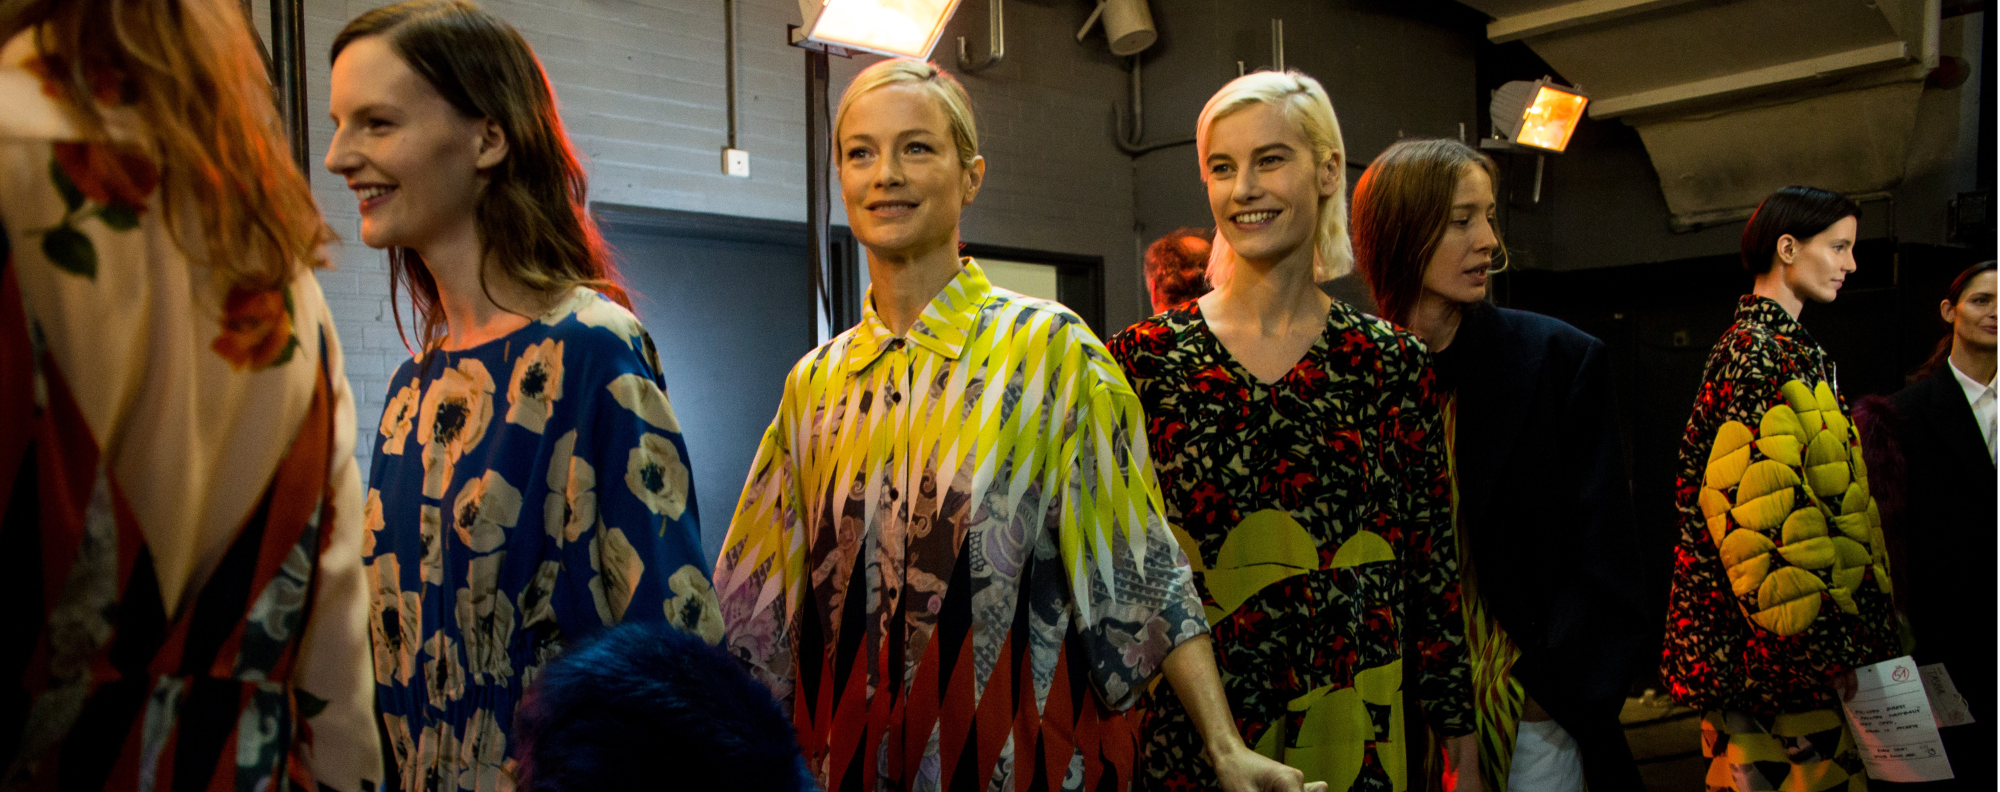 Dries Van Noten's Autumn/Winter 2017 show during Paris Fashion Week. The designer's womenswear features some menswear-inspired elements.